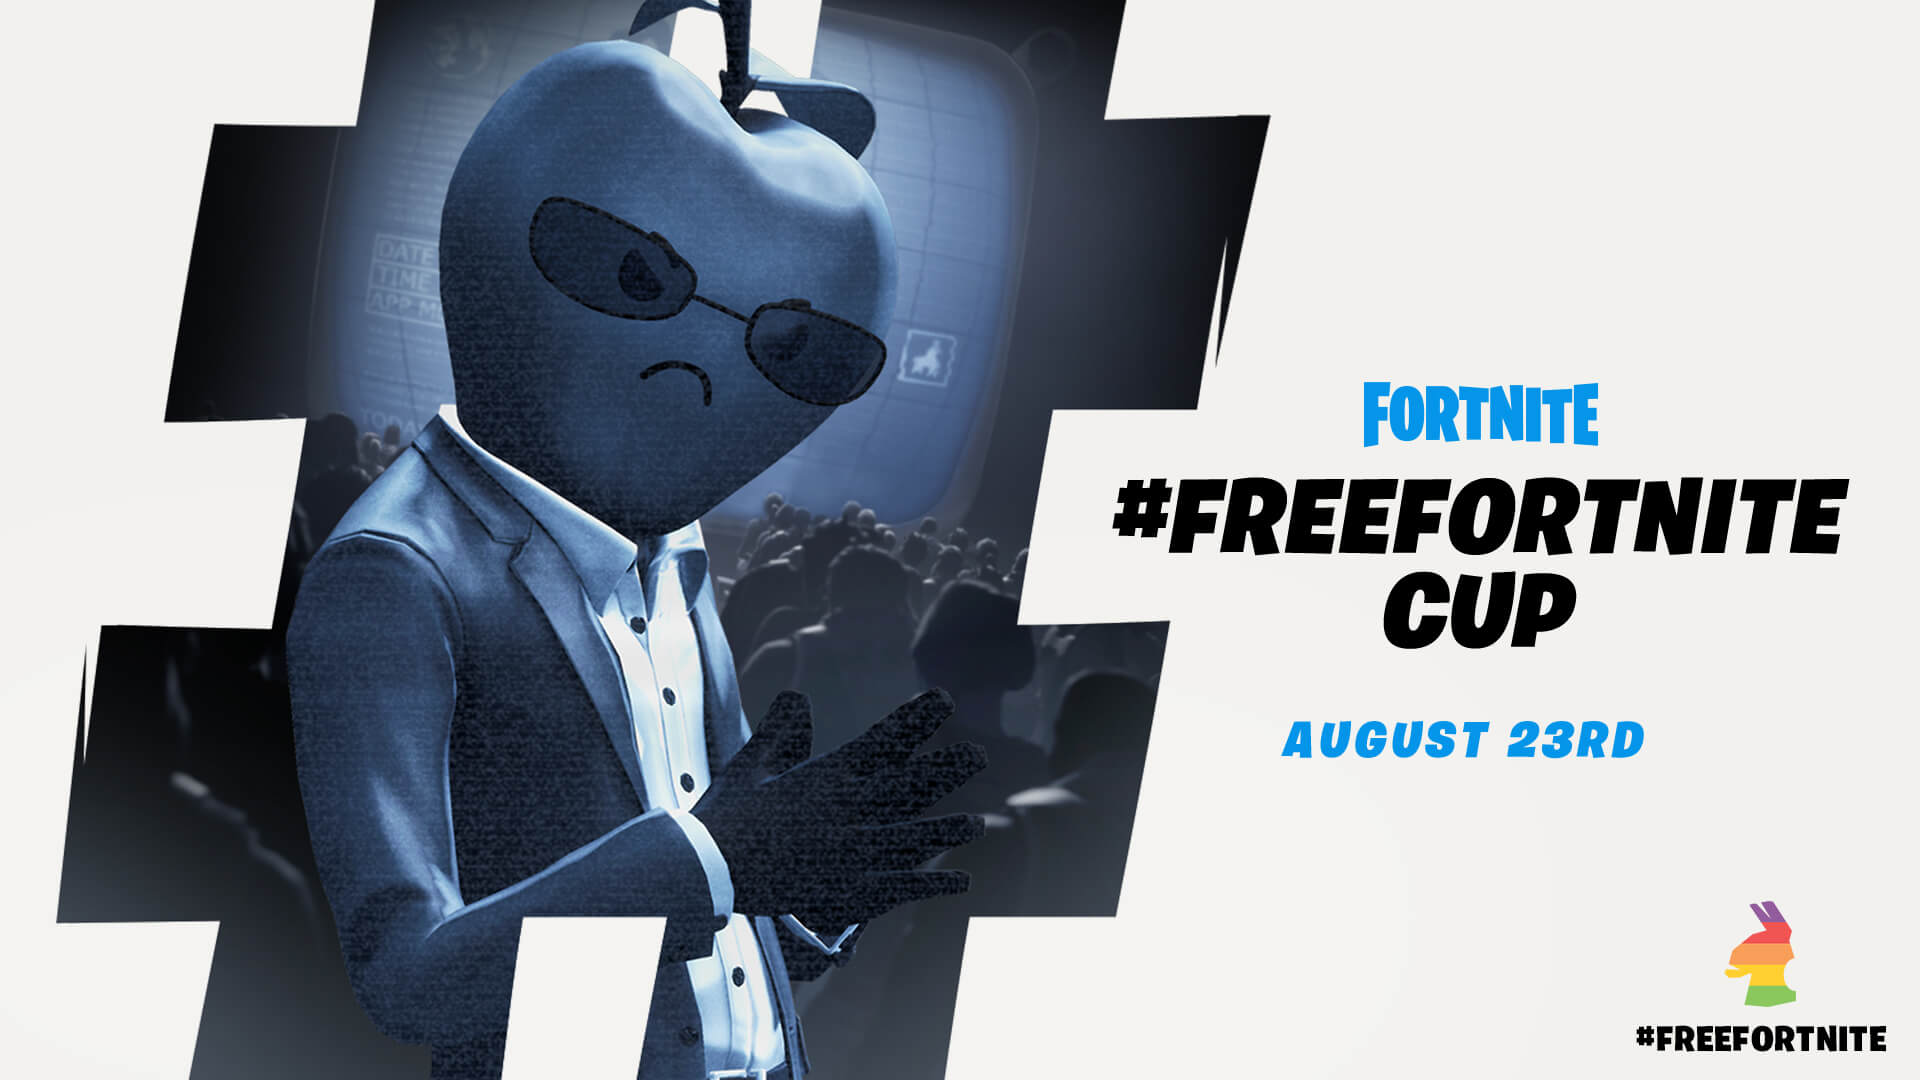 FreeFortnite event